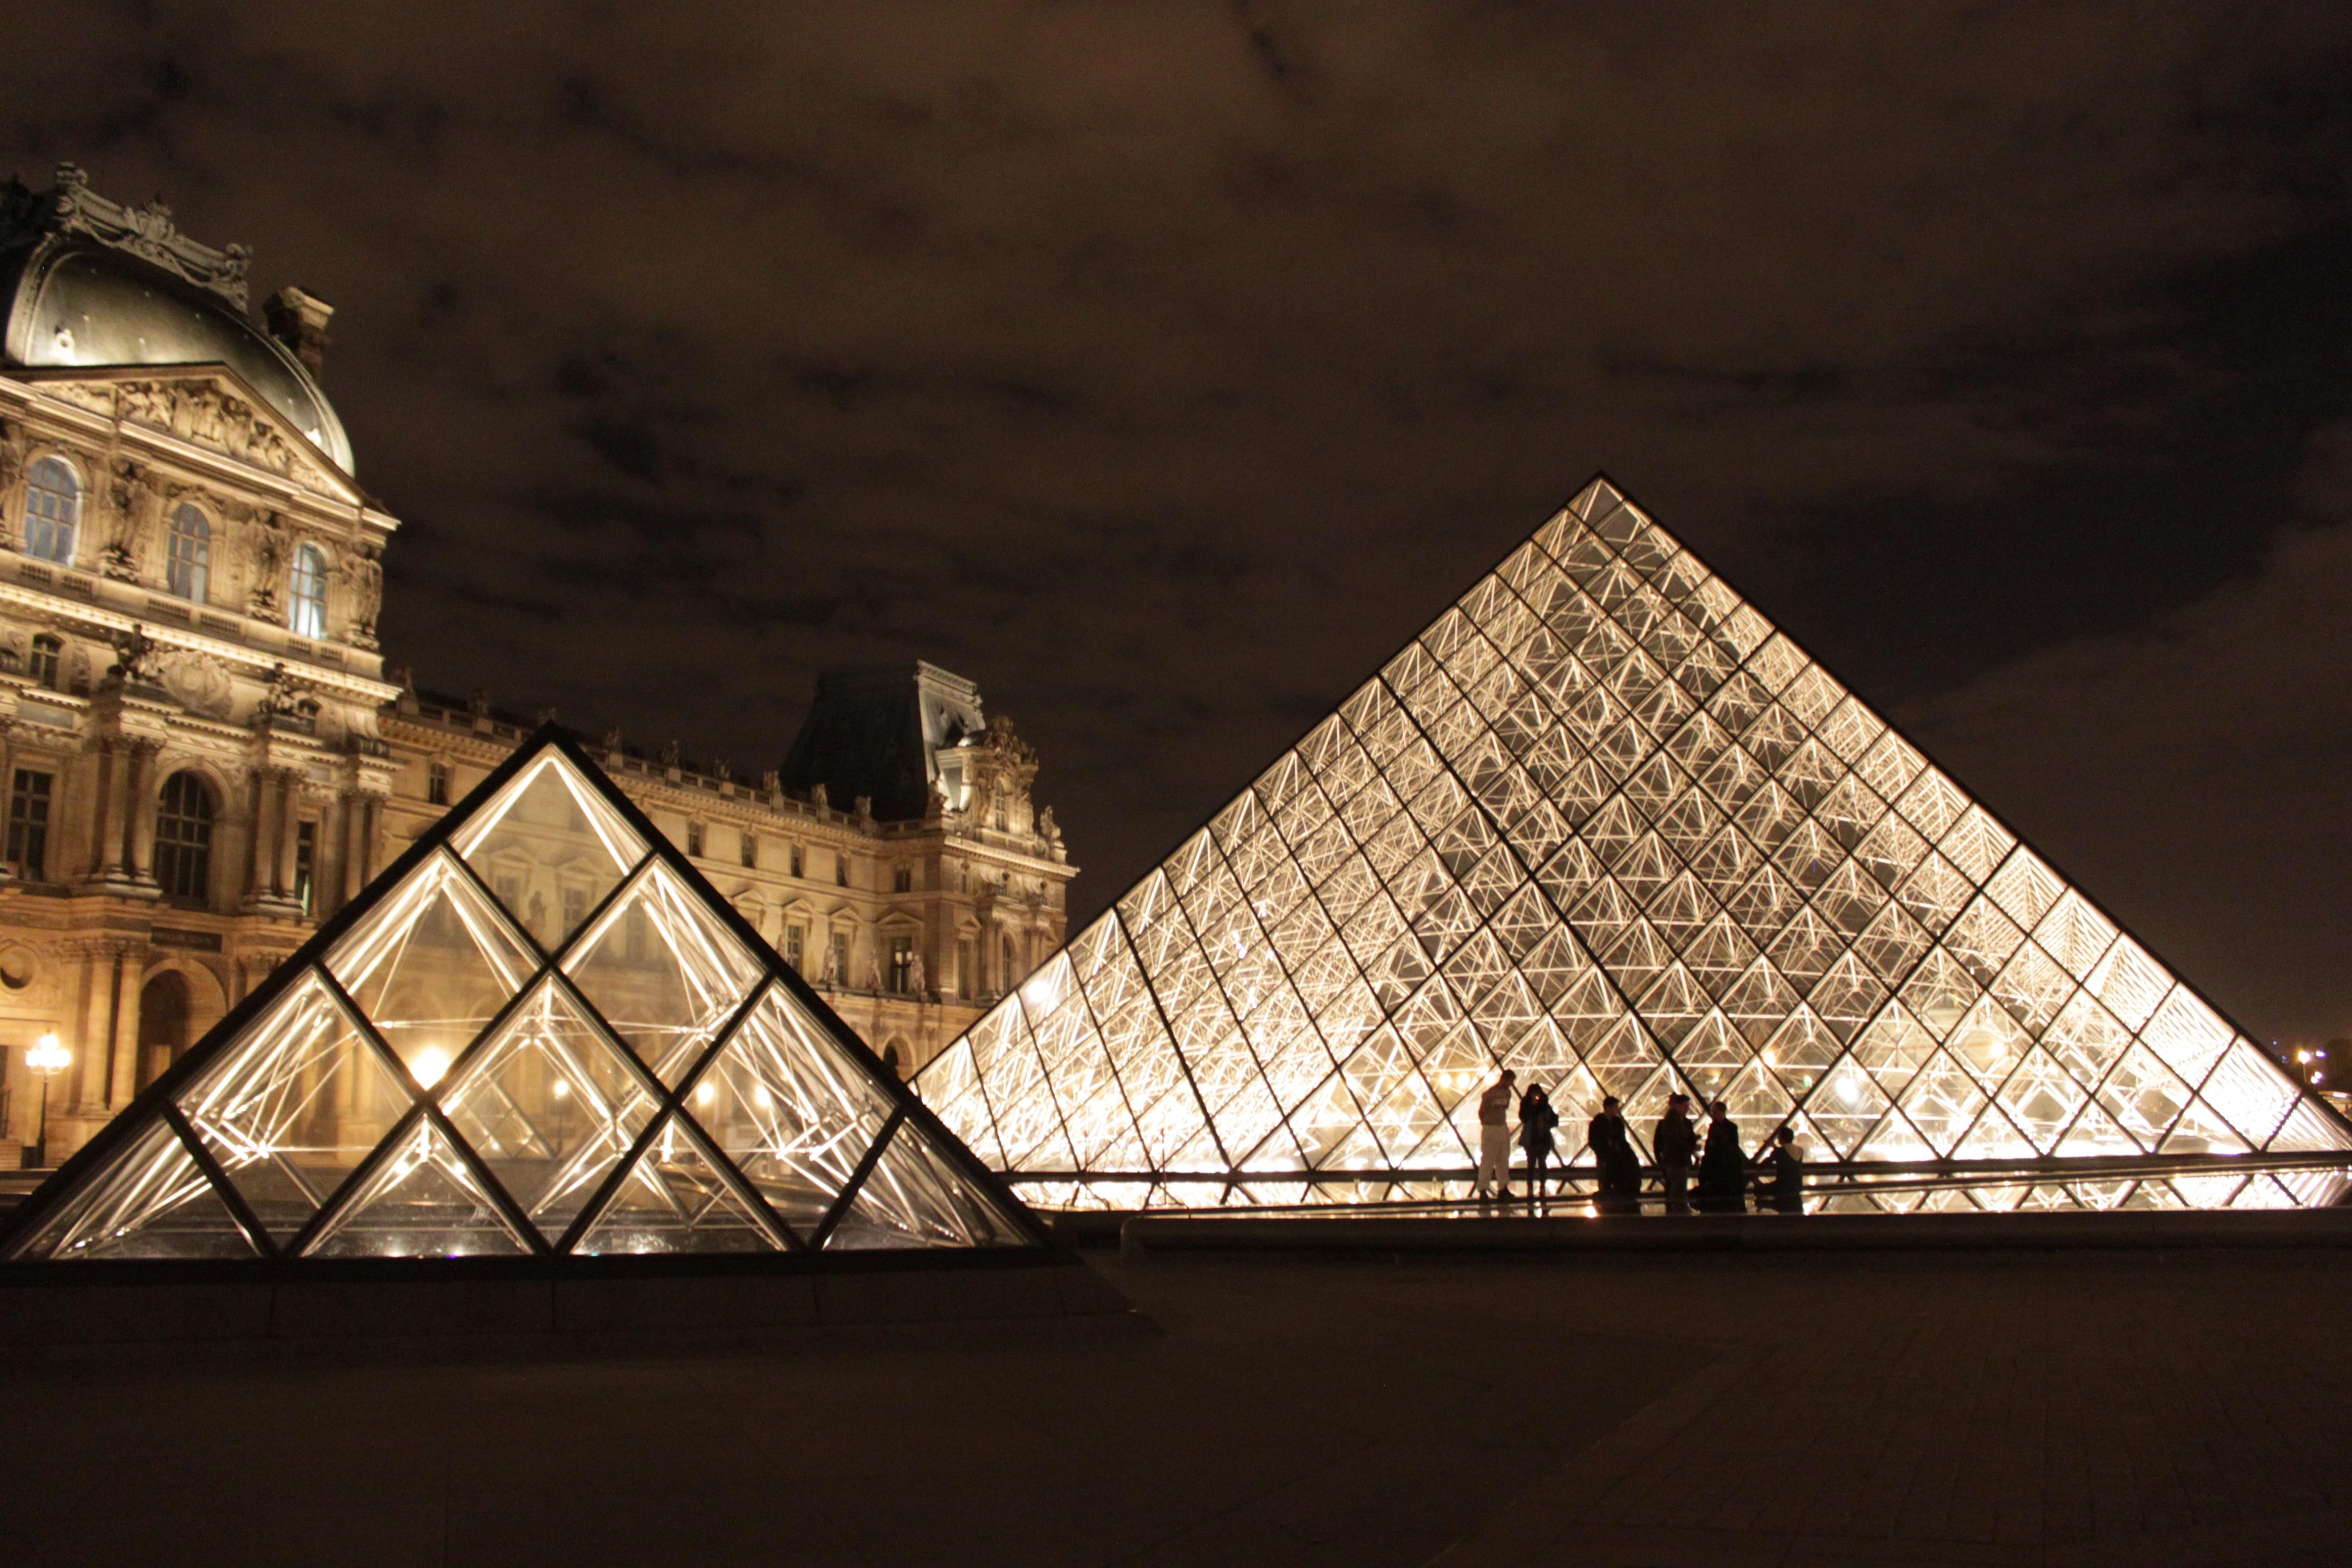 музеи мира фото архитектура юности